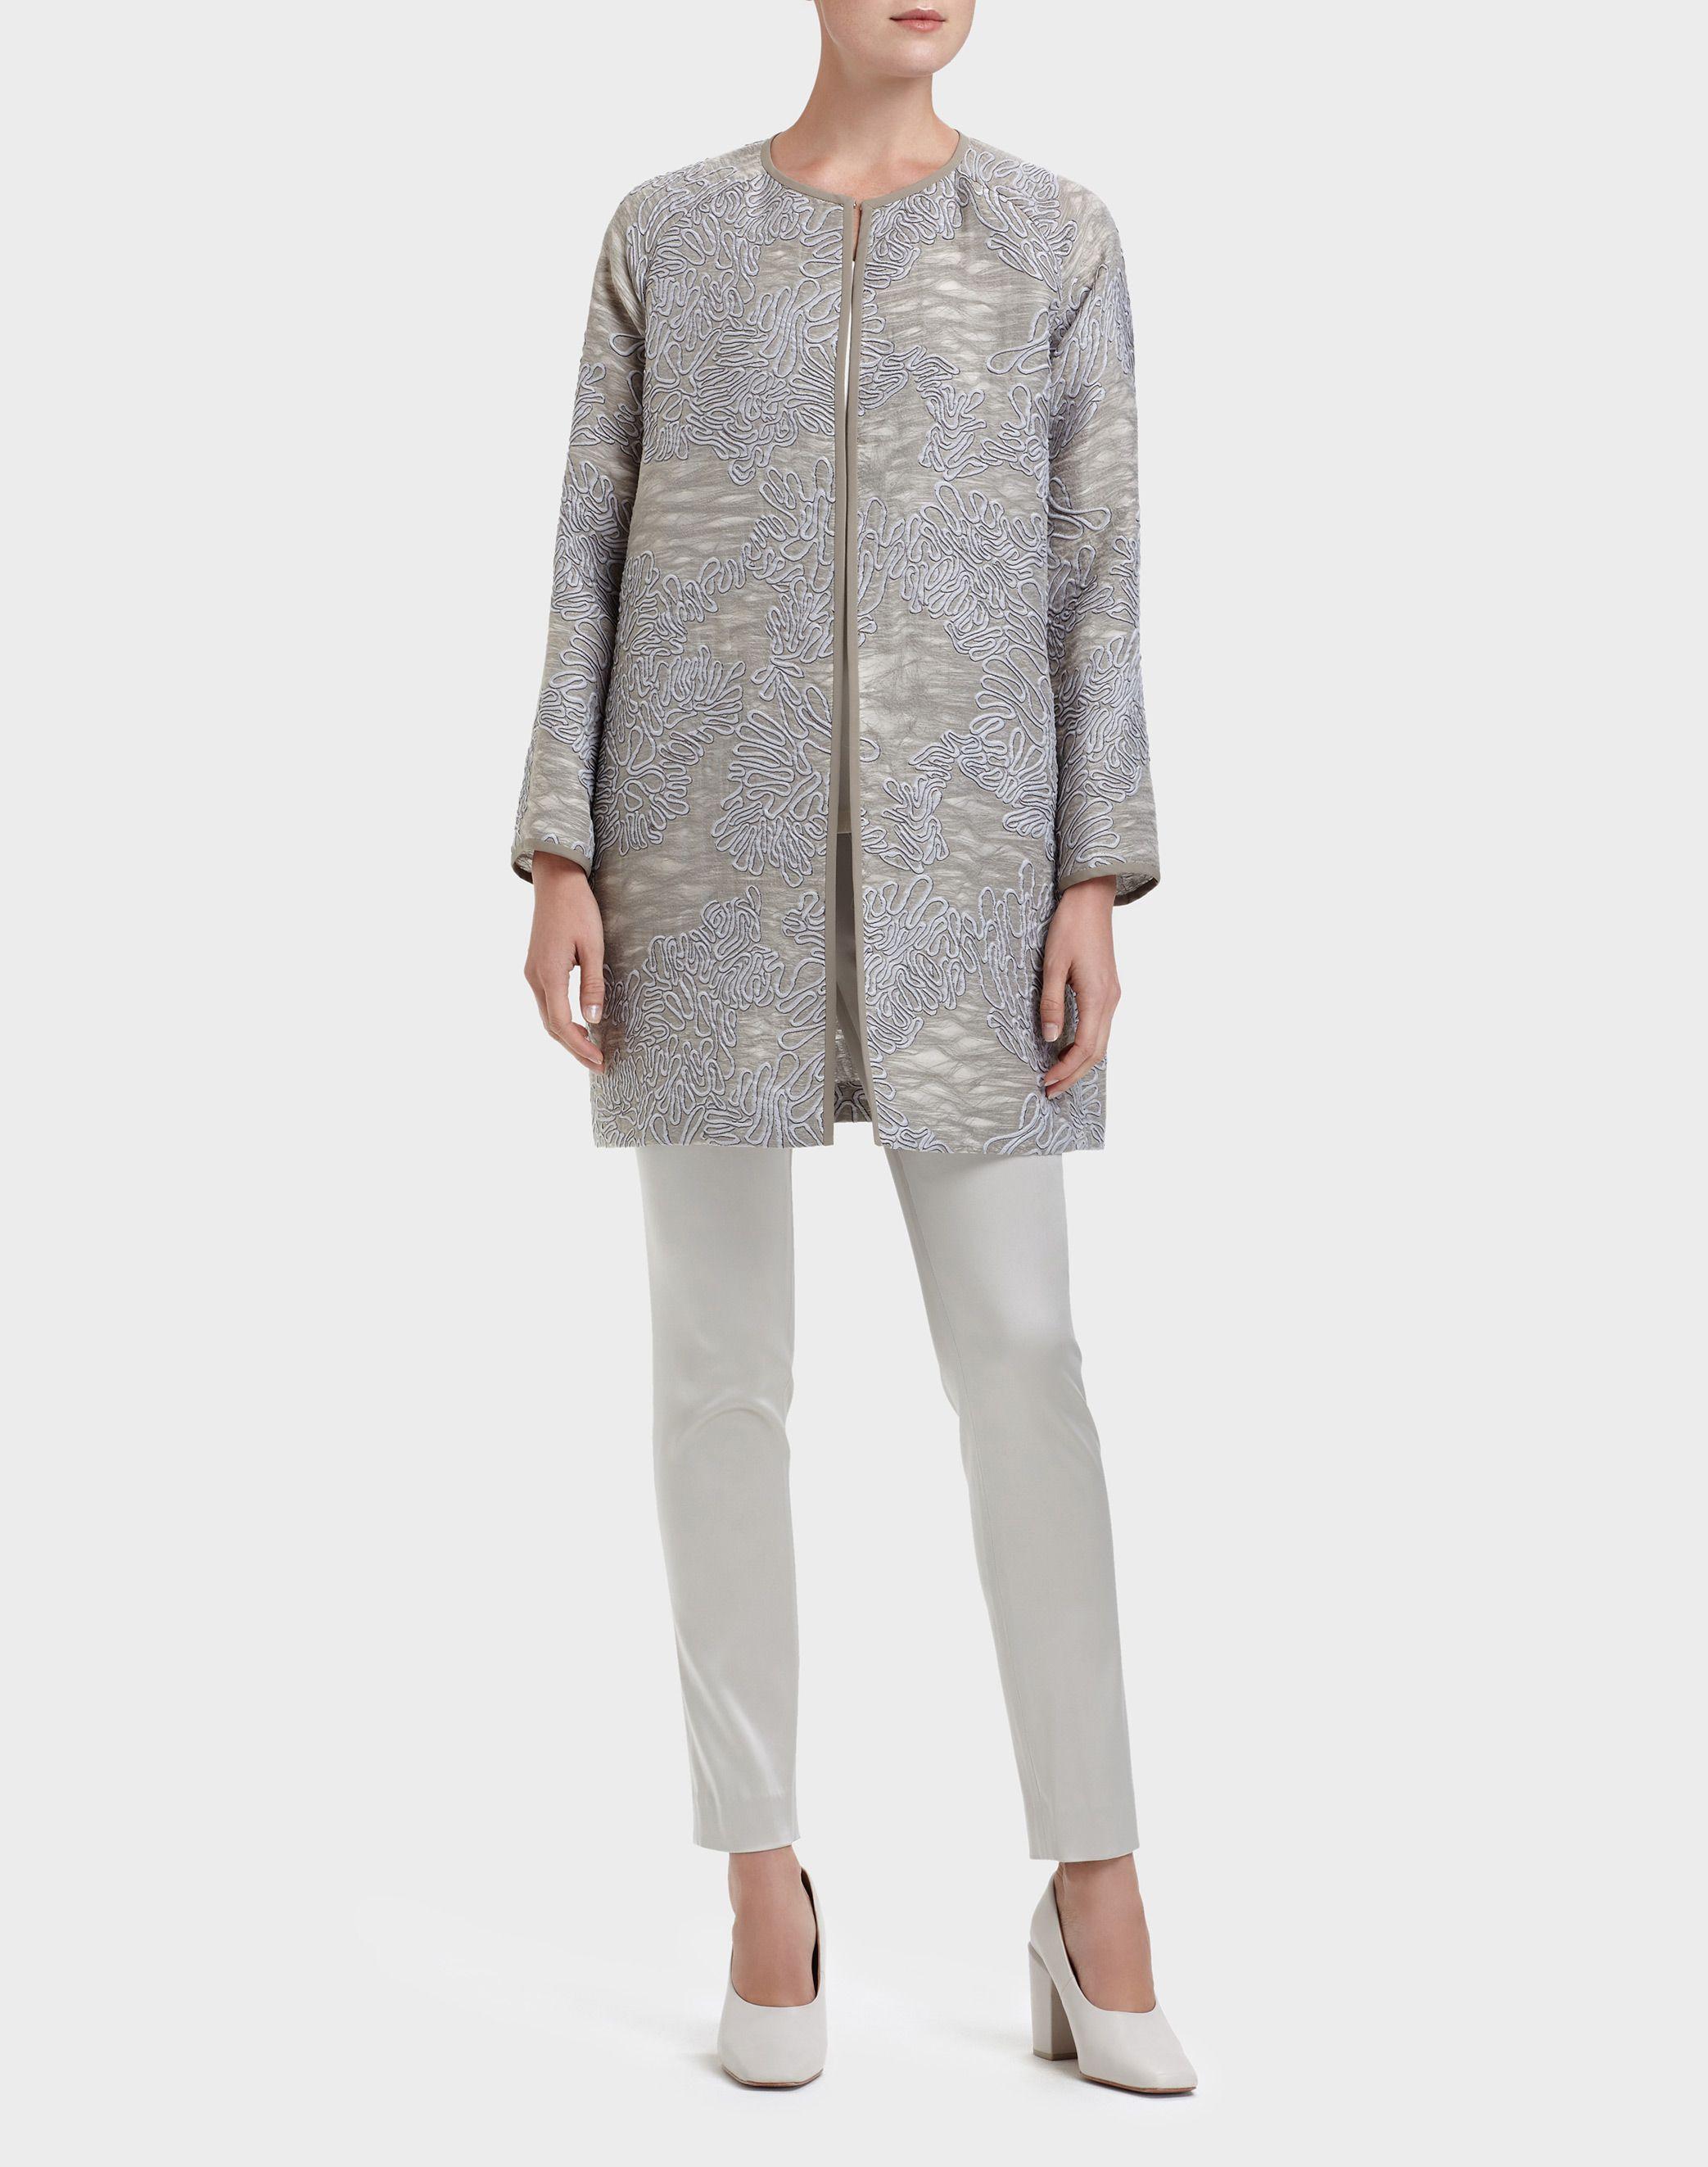 Savoire Faire Scroll Berkeley Jacket - All Sale - Sale - Collection | Lafayette 148 New York